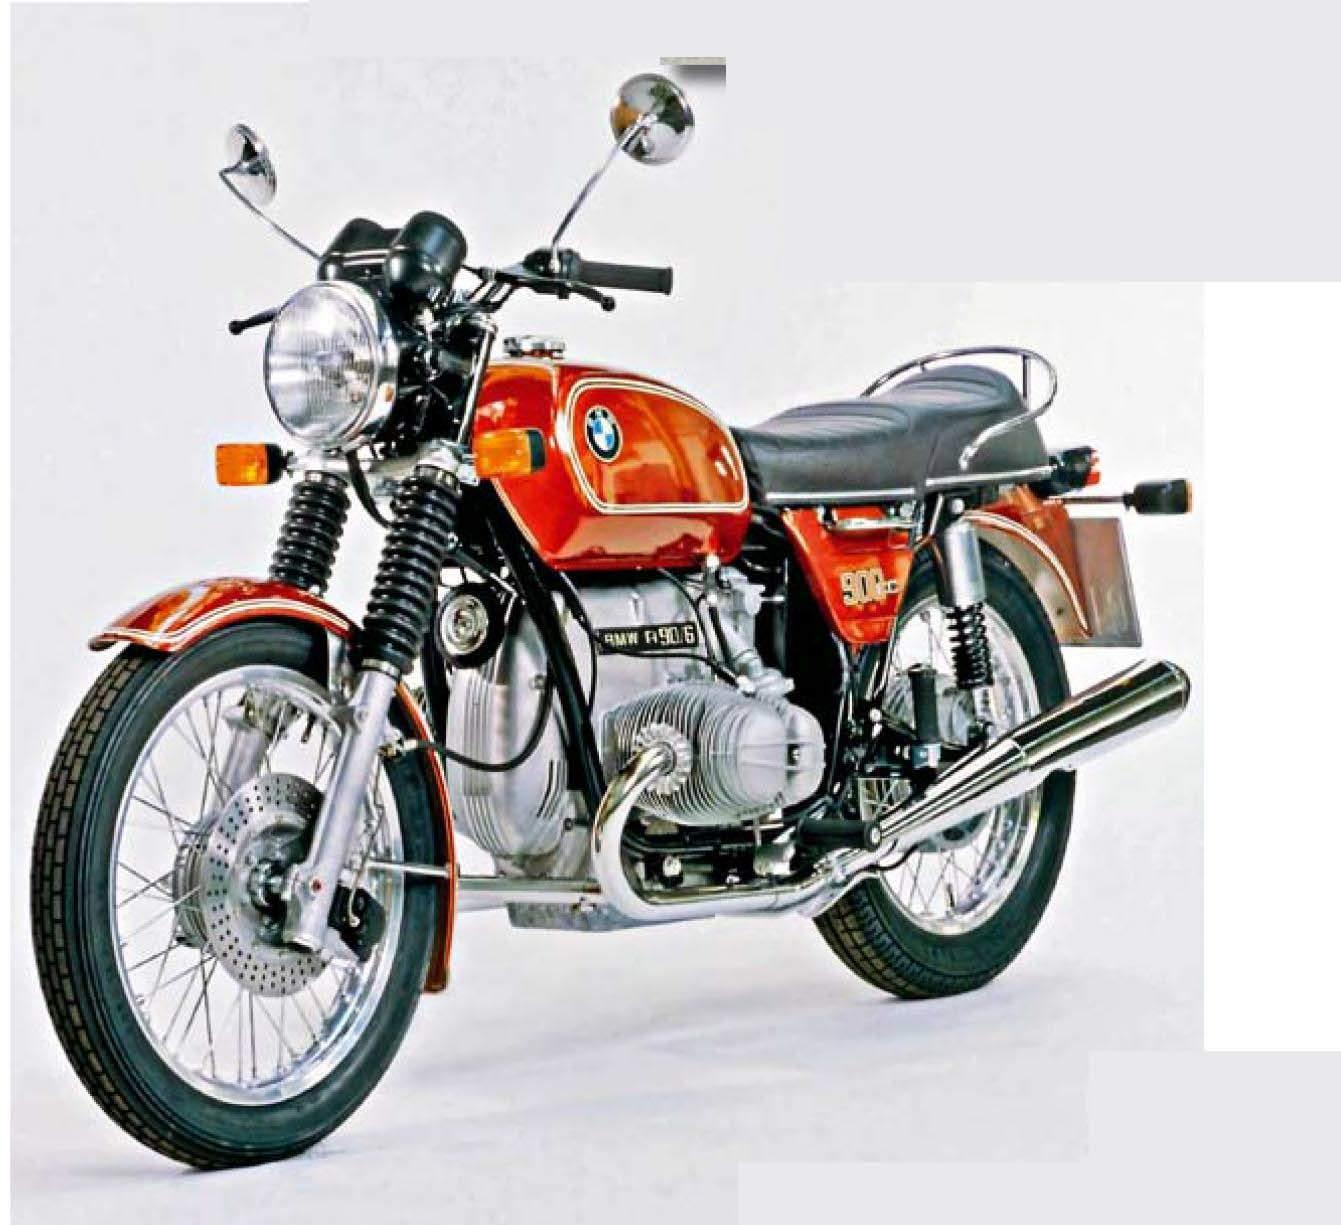 Bmwr: 1973, 1974, 1975, 1976